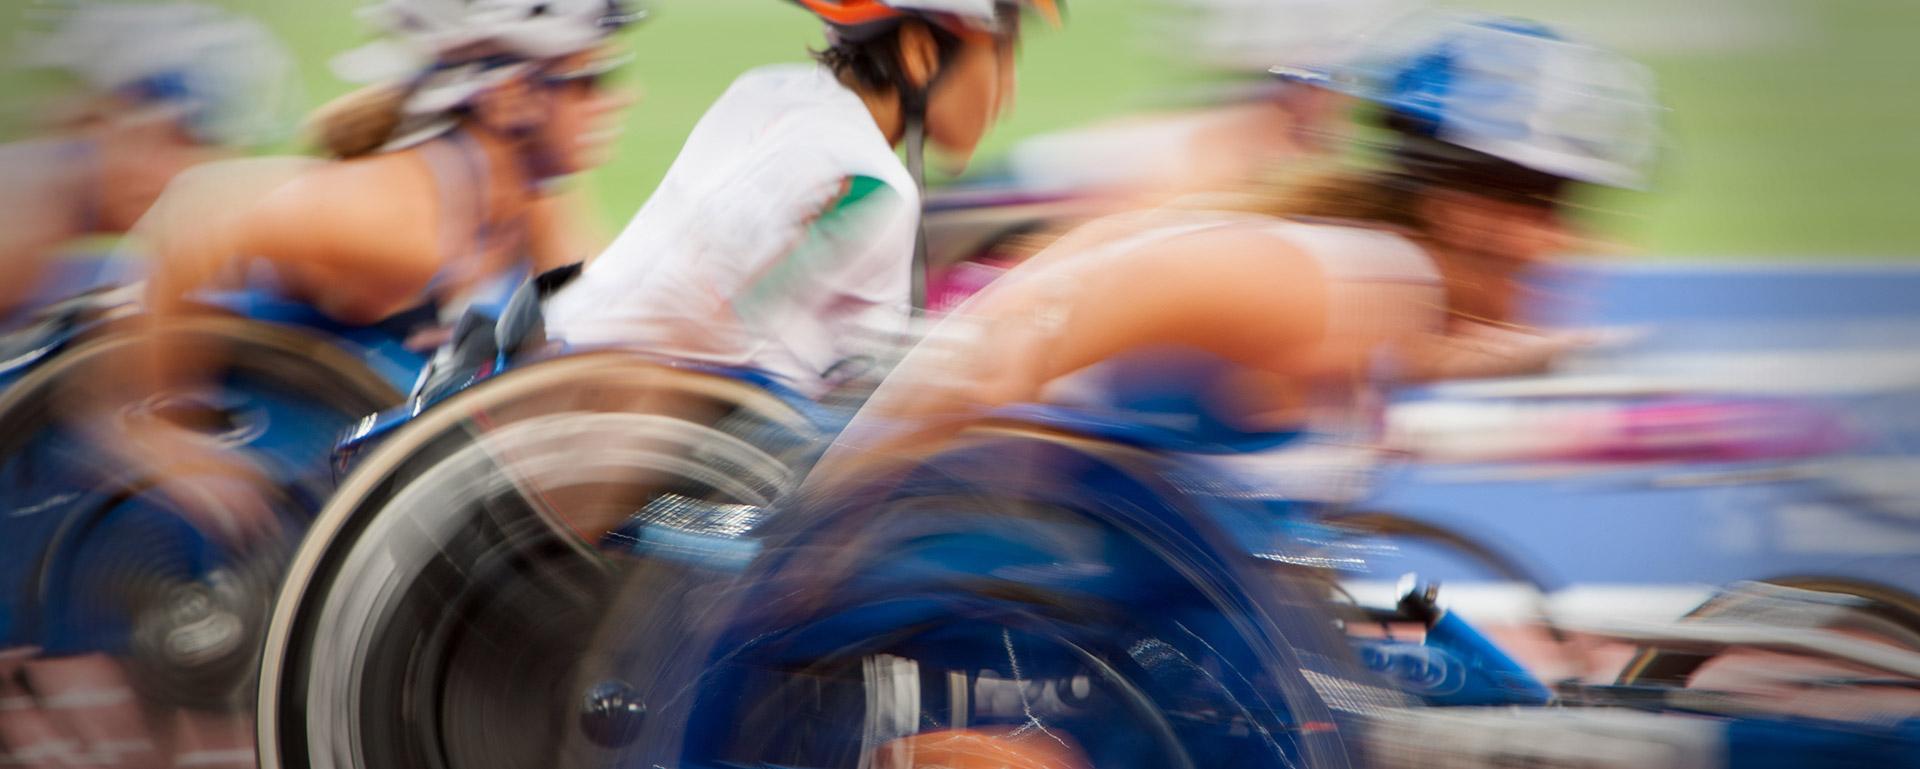 Igrzyska Paraolimpijskie Tokio 2021